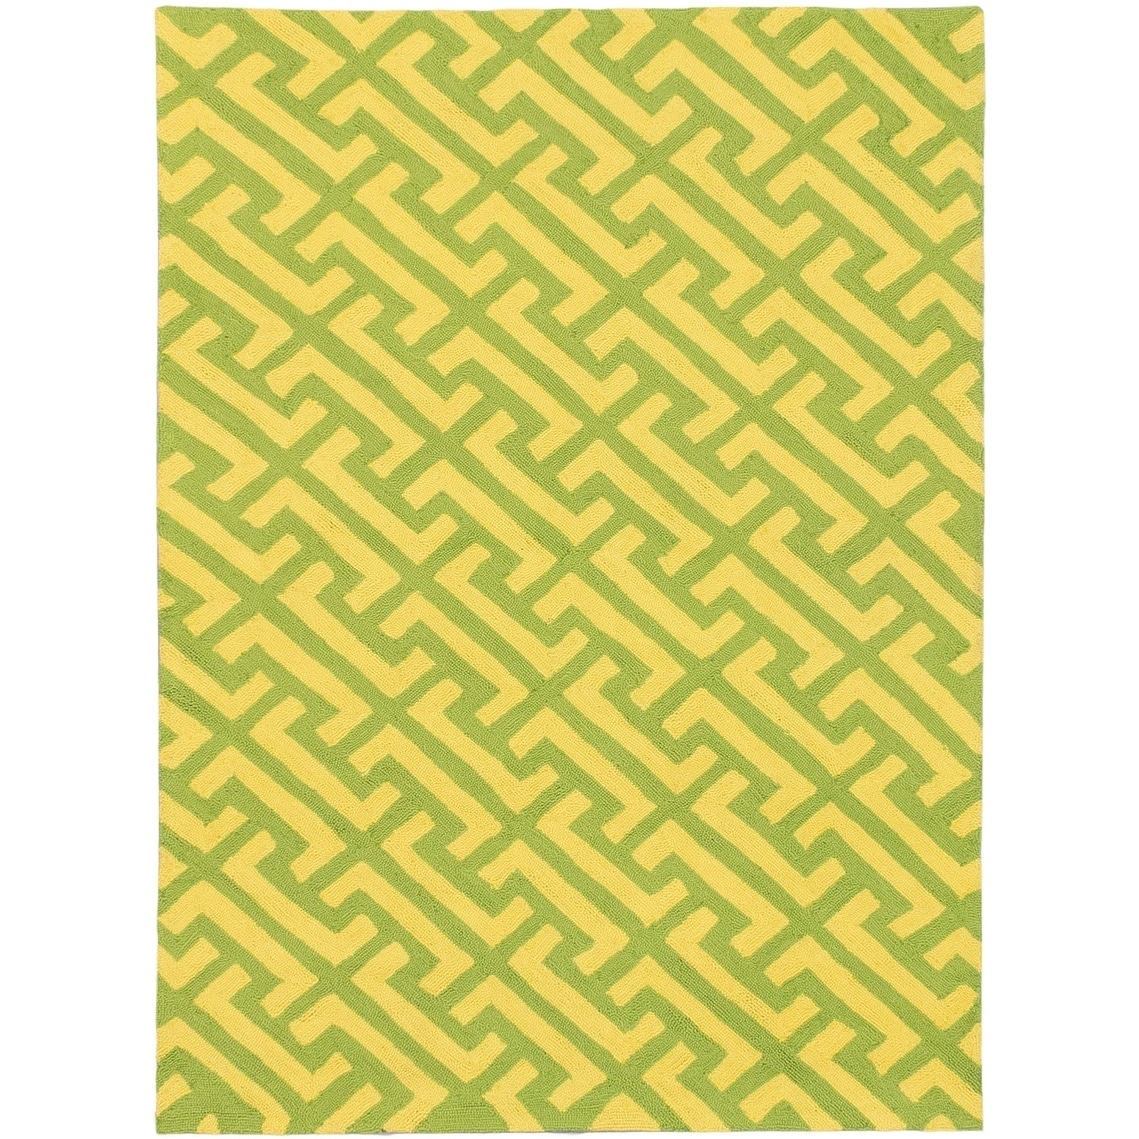 ECARPETGALLERY Hooked Erman Emerald Green, Yellow Polypropylene Rug - 50 x 70 (Green/Yellow - 50 x 70)